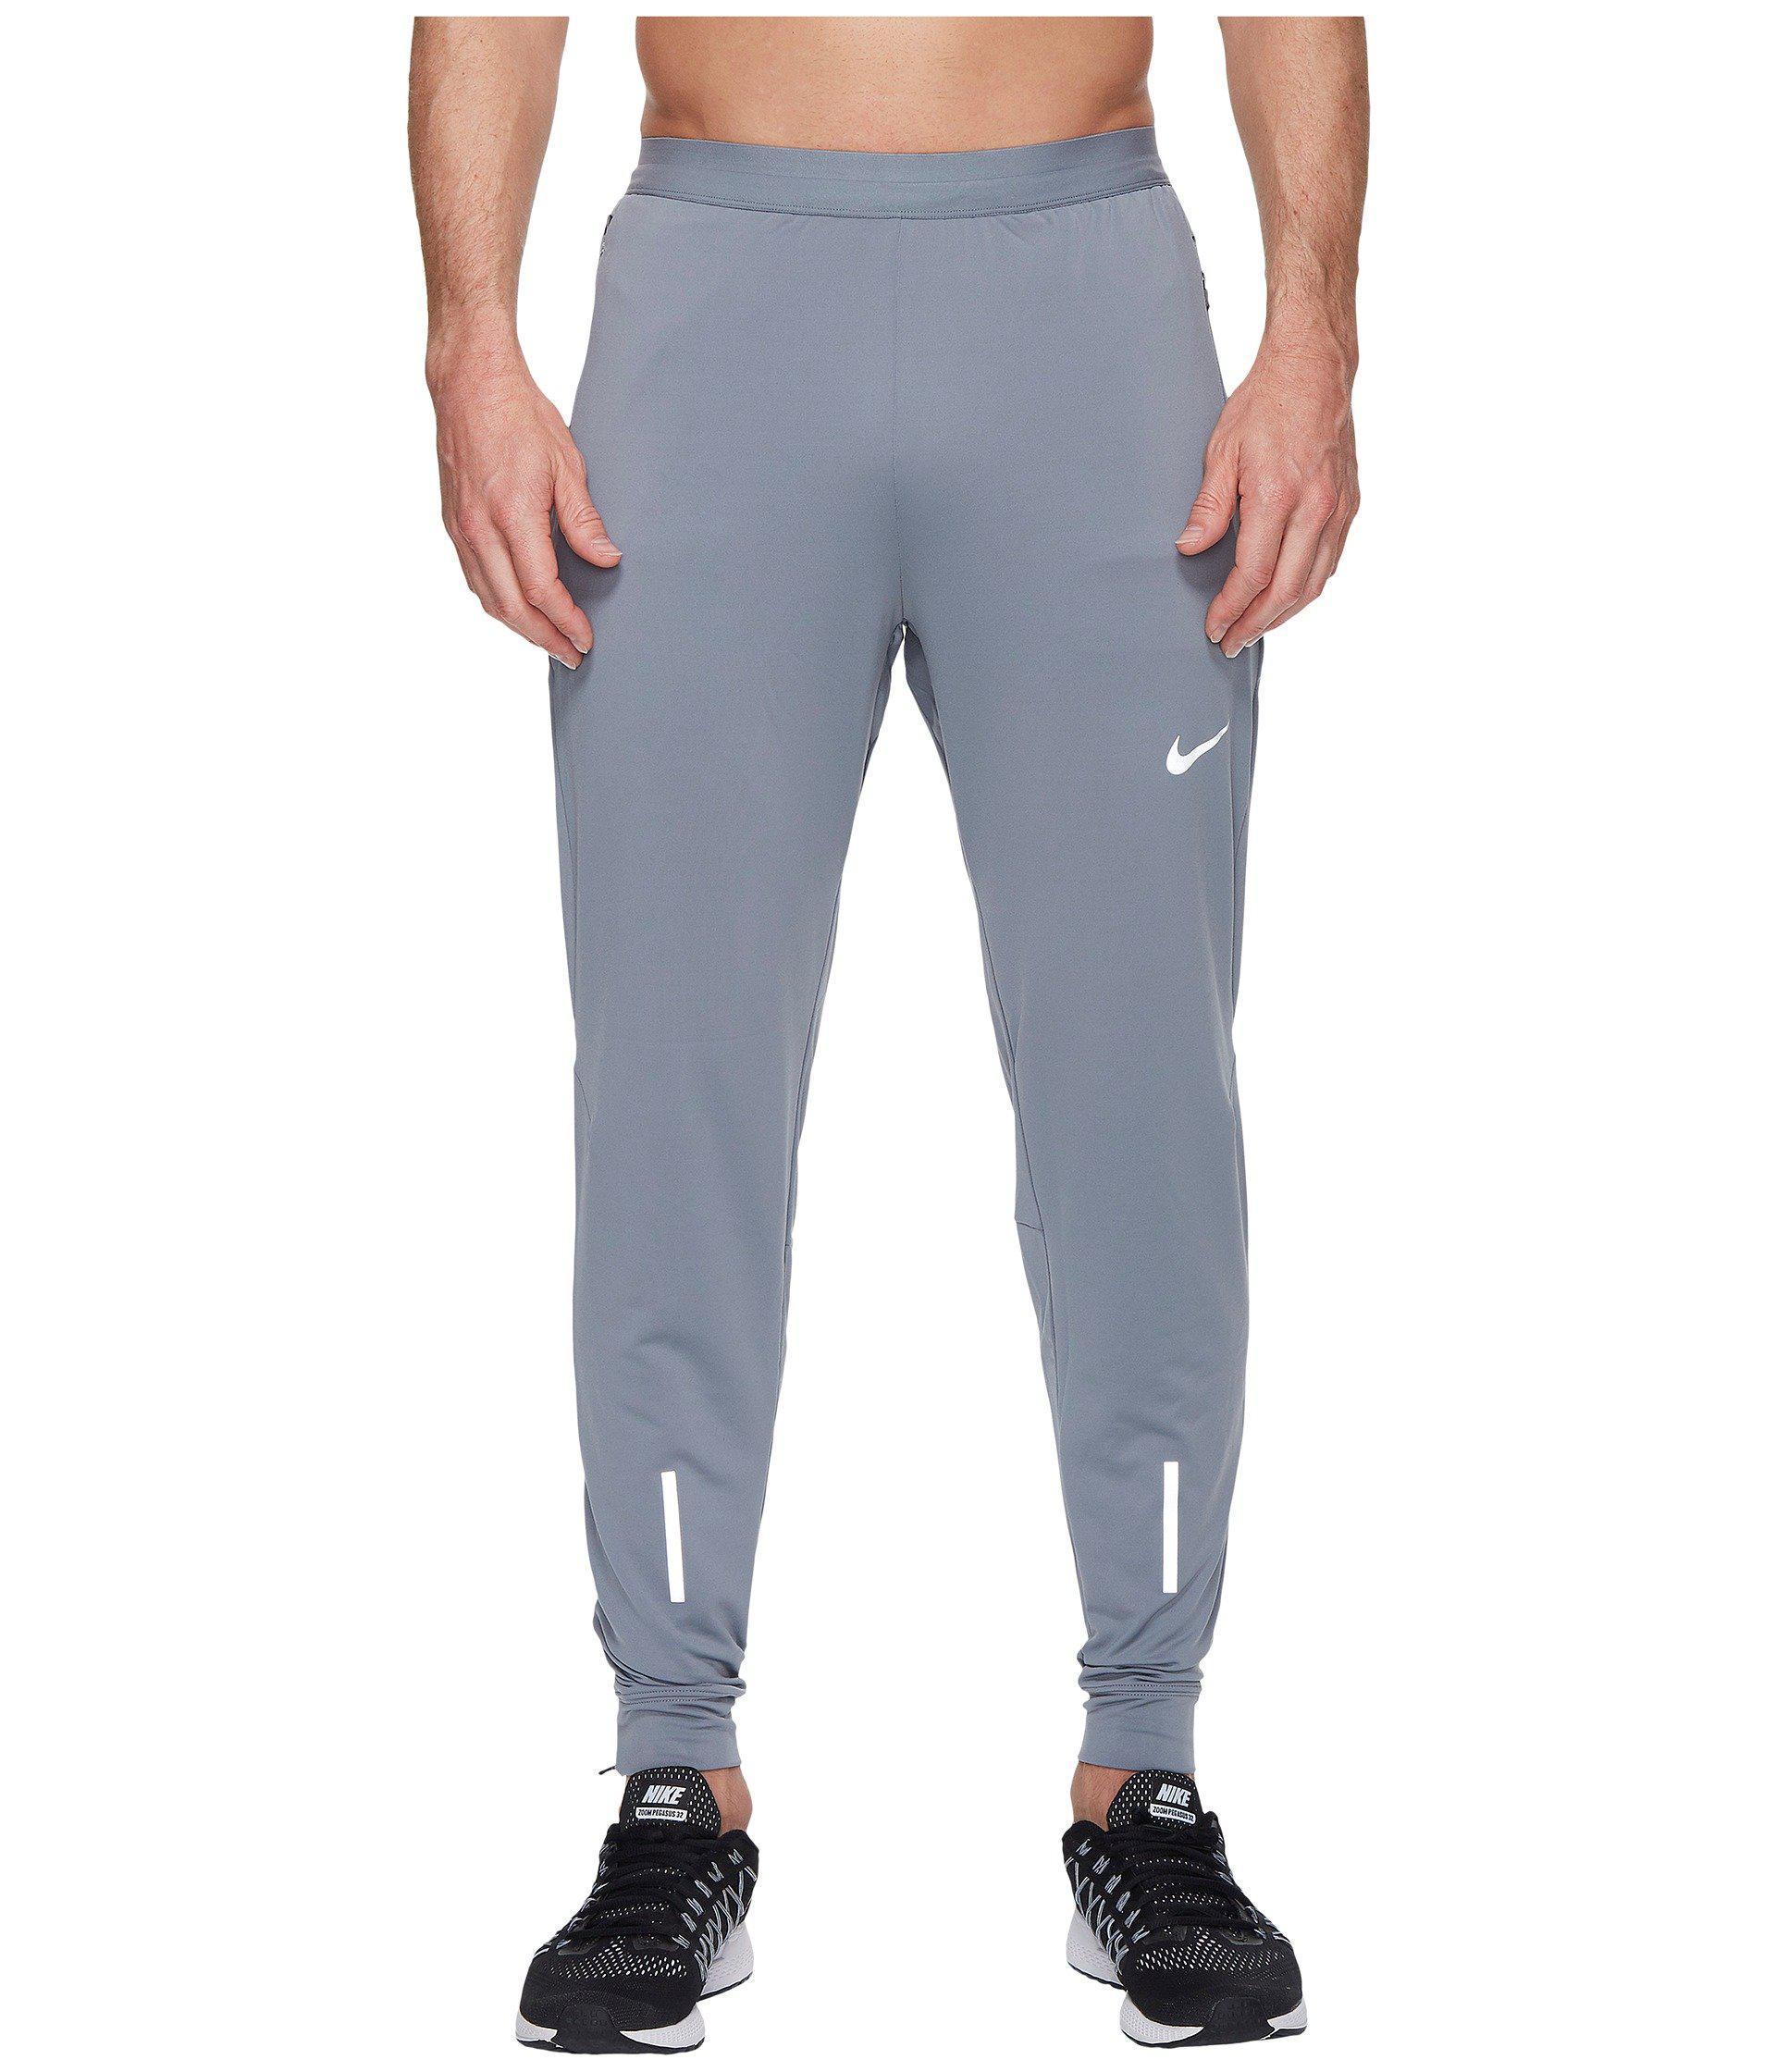 b7b114f2d6cb Lyst - Nike Dry Phenom Running Pant in Gray for Men